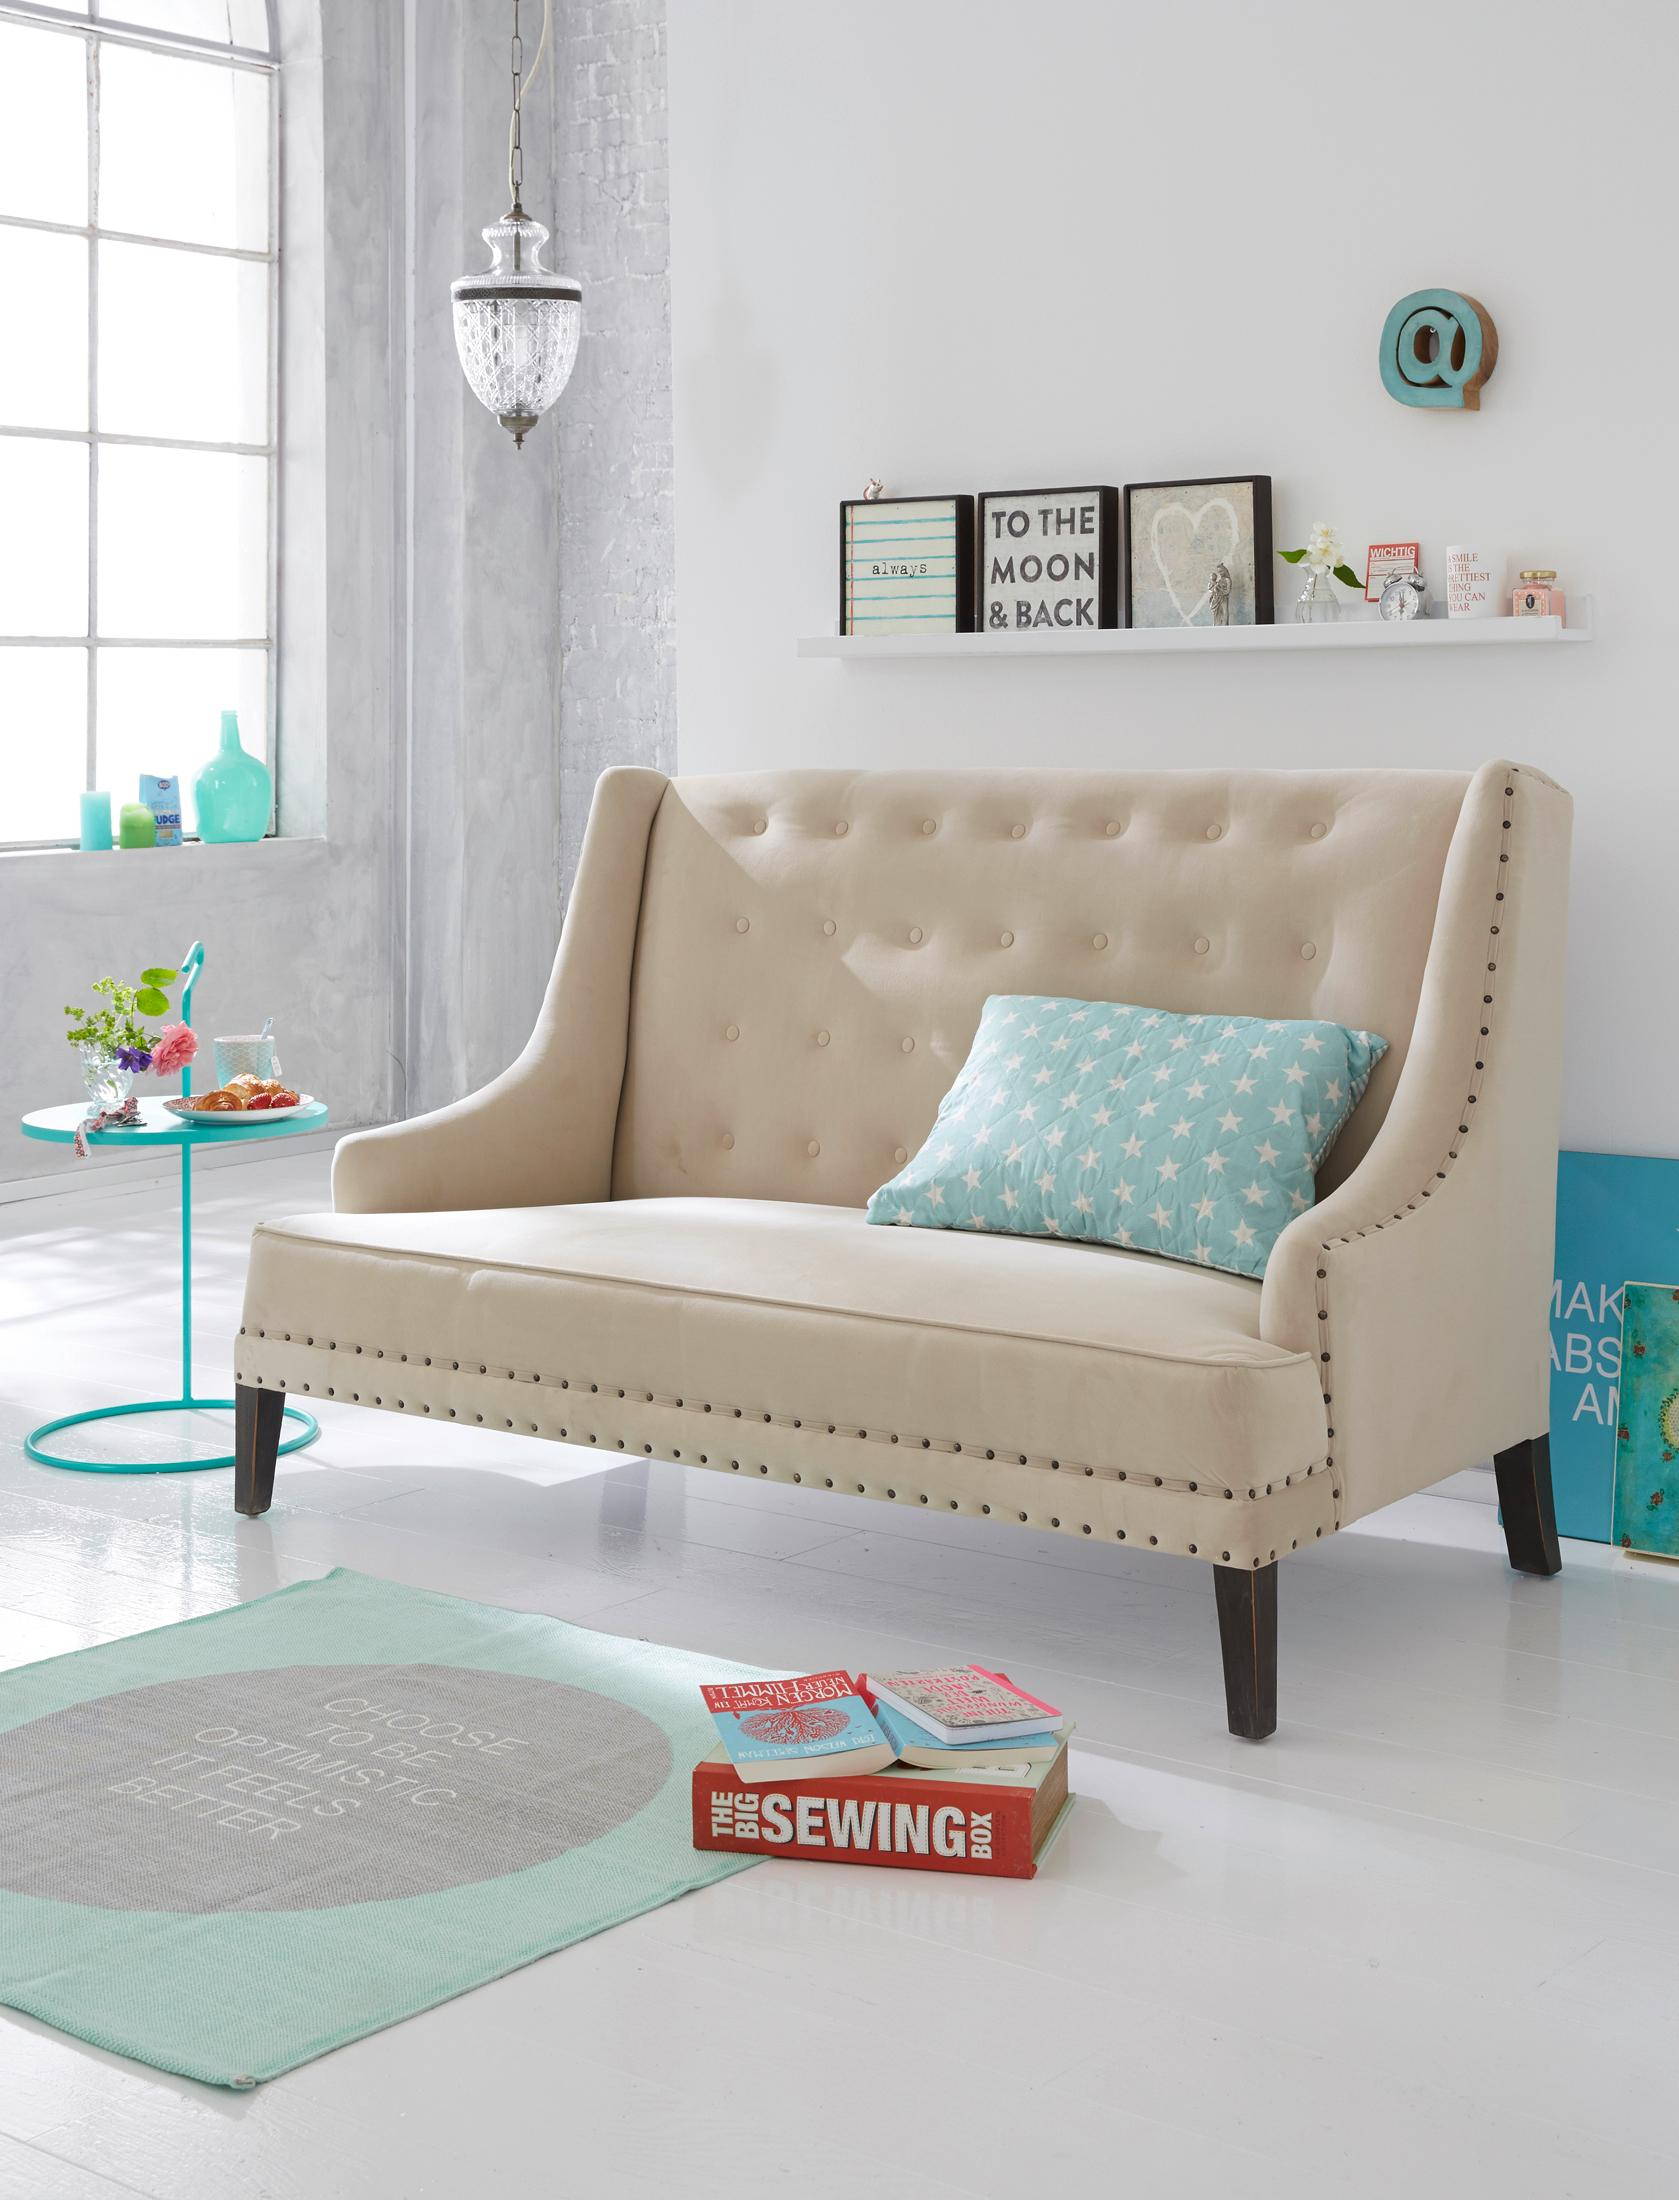 cremefarben bilder ideen couchstyle. Black Bedroom Furniture Sets. Home Design Ideas